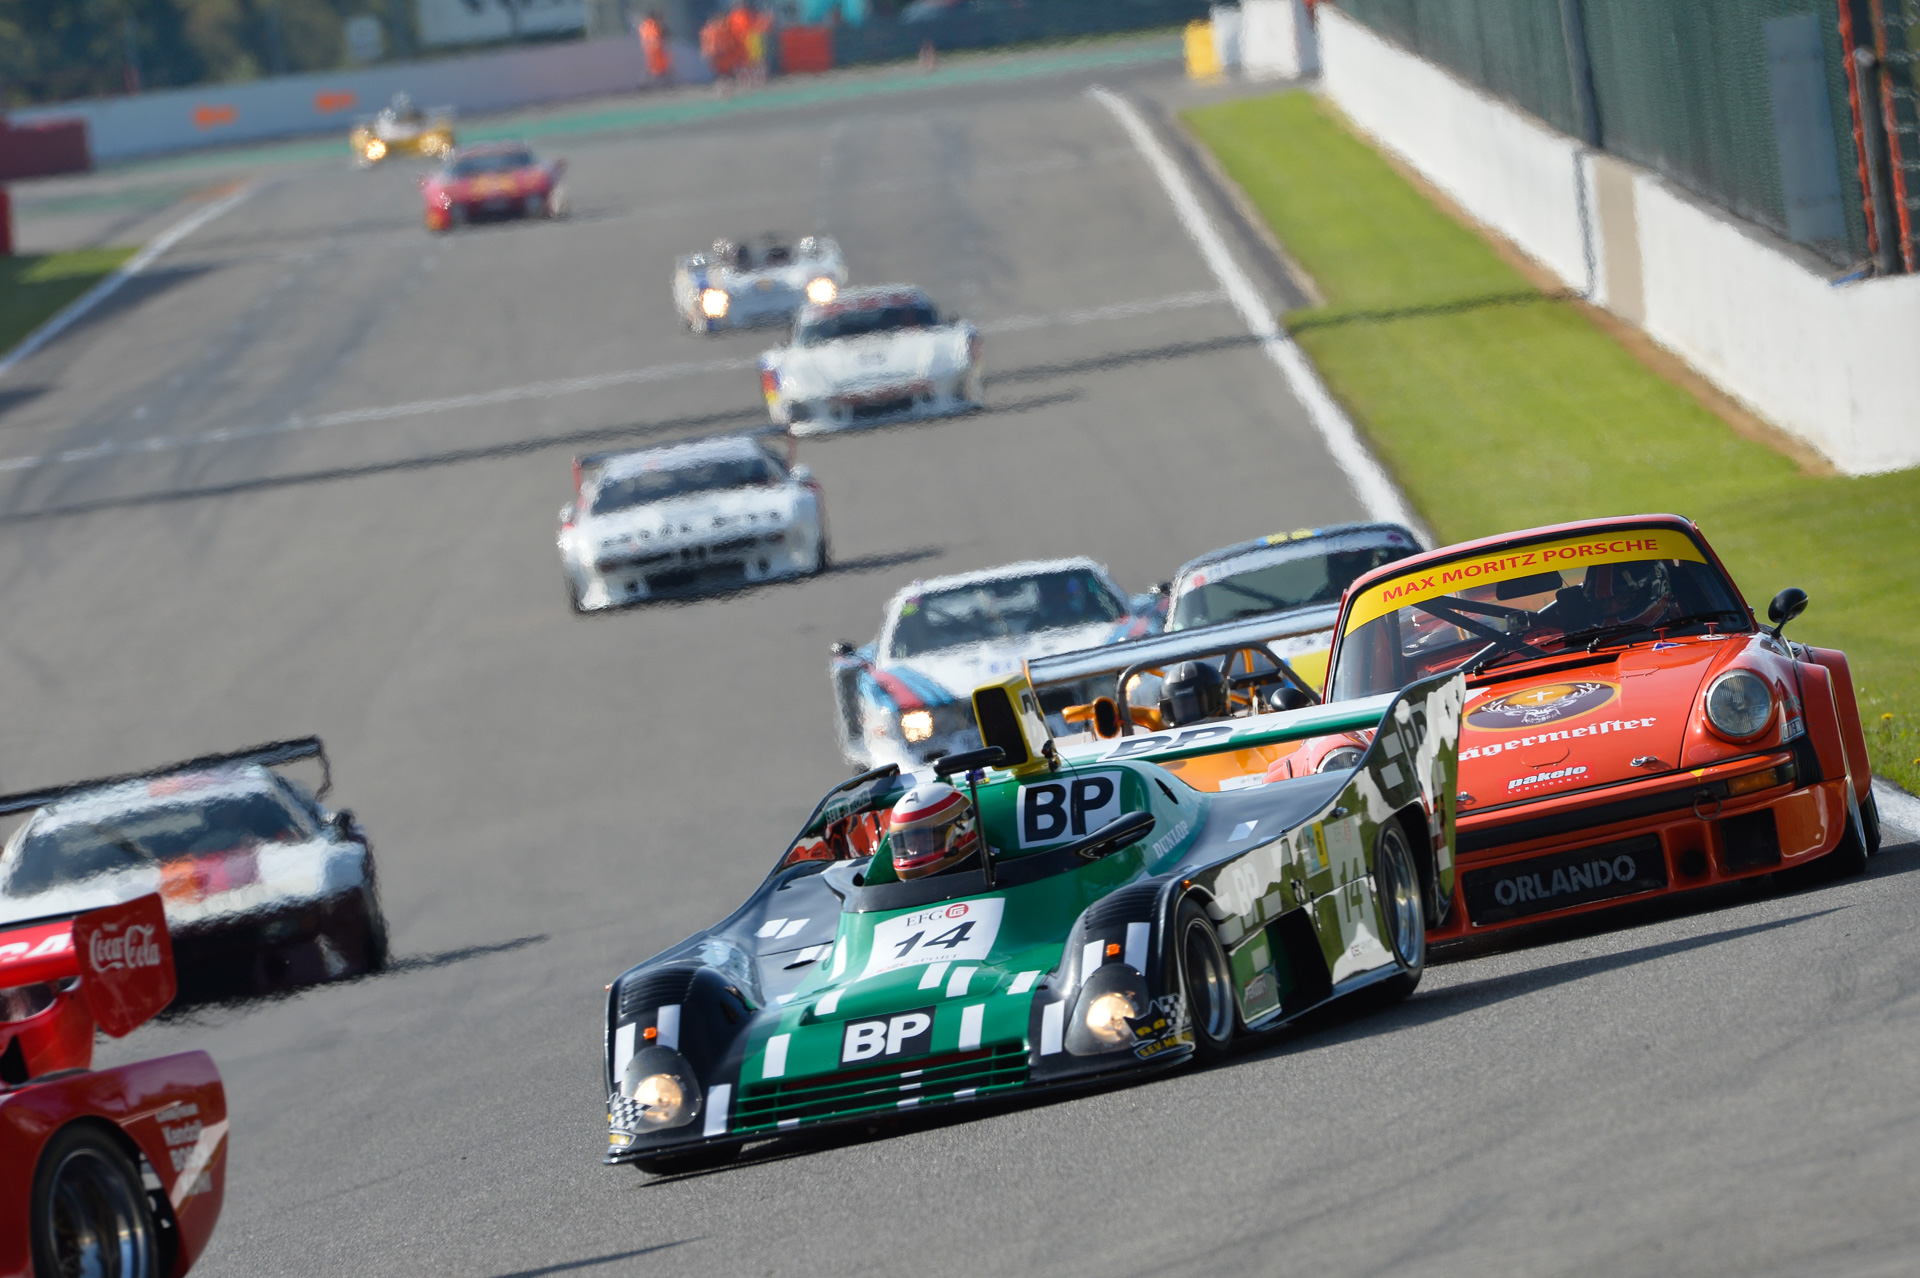 Monza Historic: Classic Endurance Racing